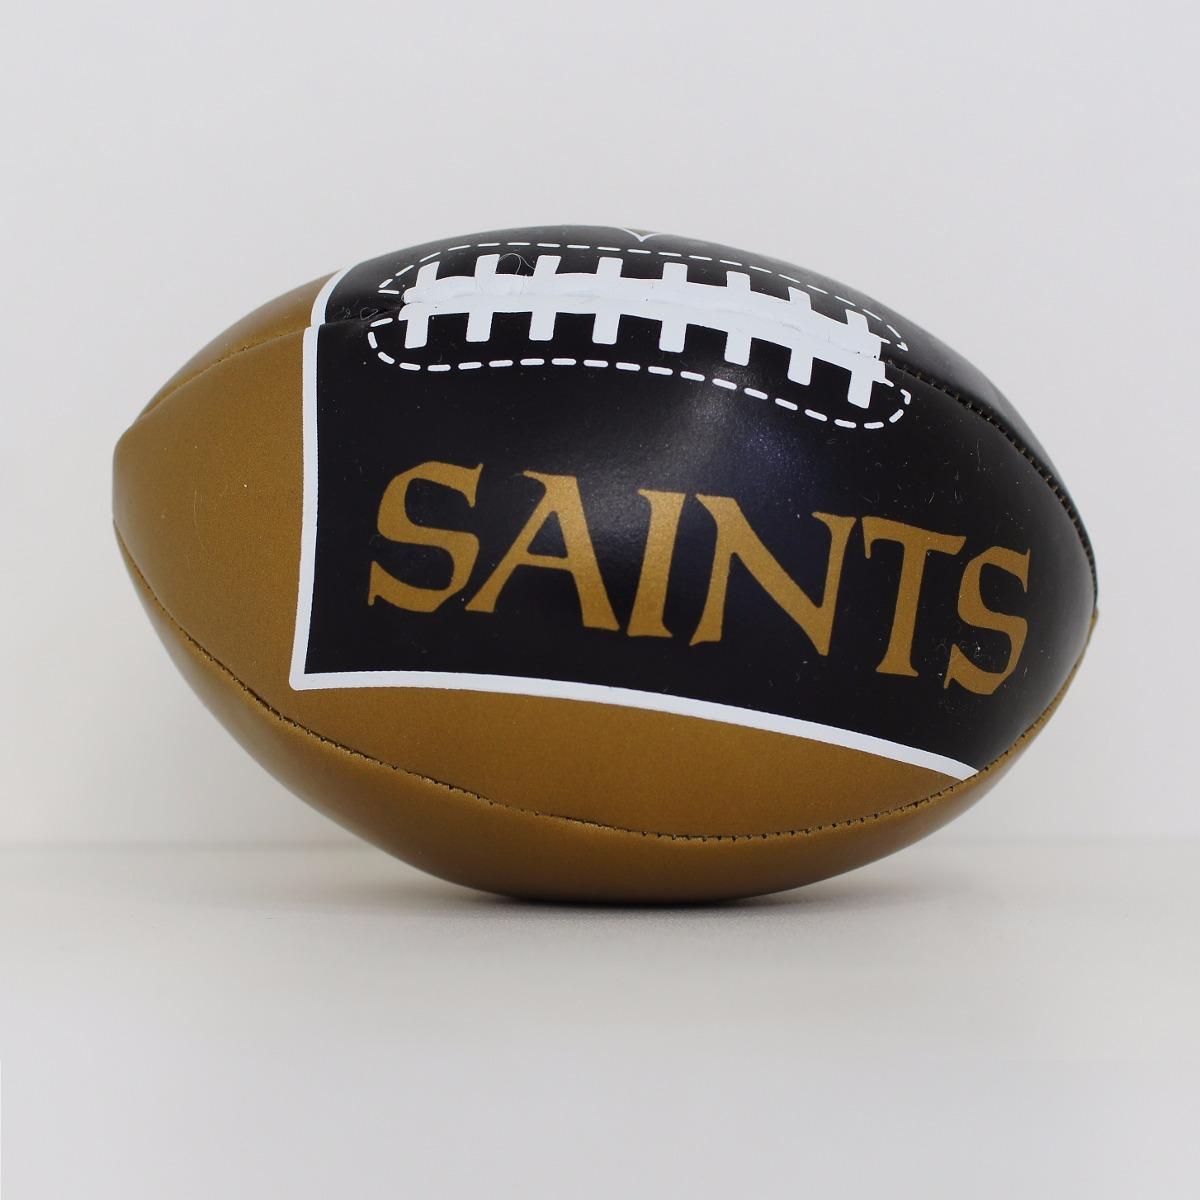 f60504881 mini bola futebol americano - nfl - new orleans saints. Carregando zoom.